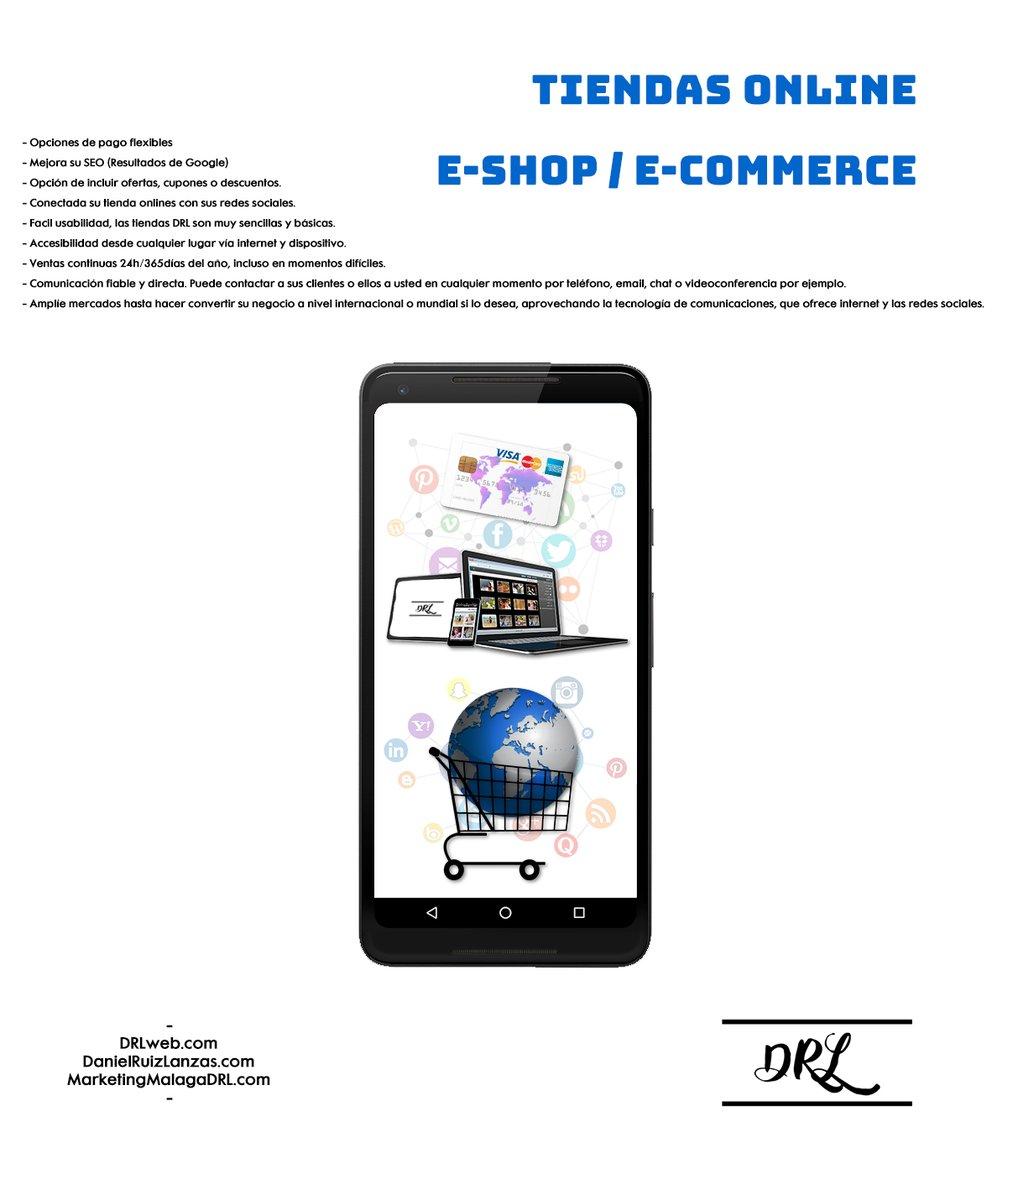 #TiendasOnline #EShop #Ecommerce #DRL #DRLweb #MarketingMalagaDRL #DanielRuizLanzas #Evolucionesunegocio https://t.co/NrD19pbNcV